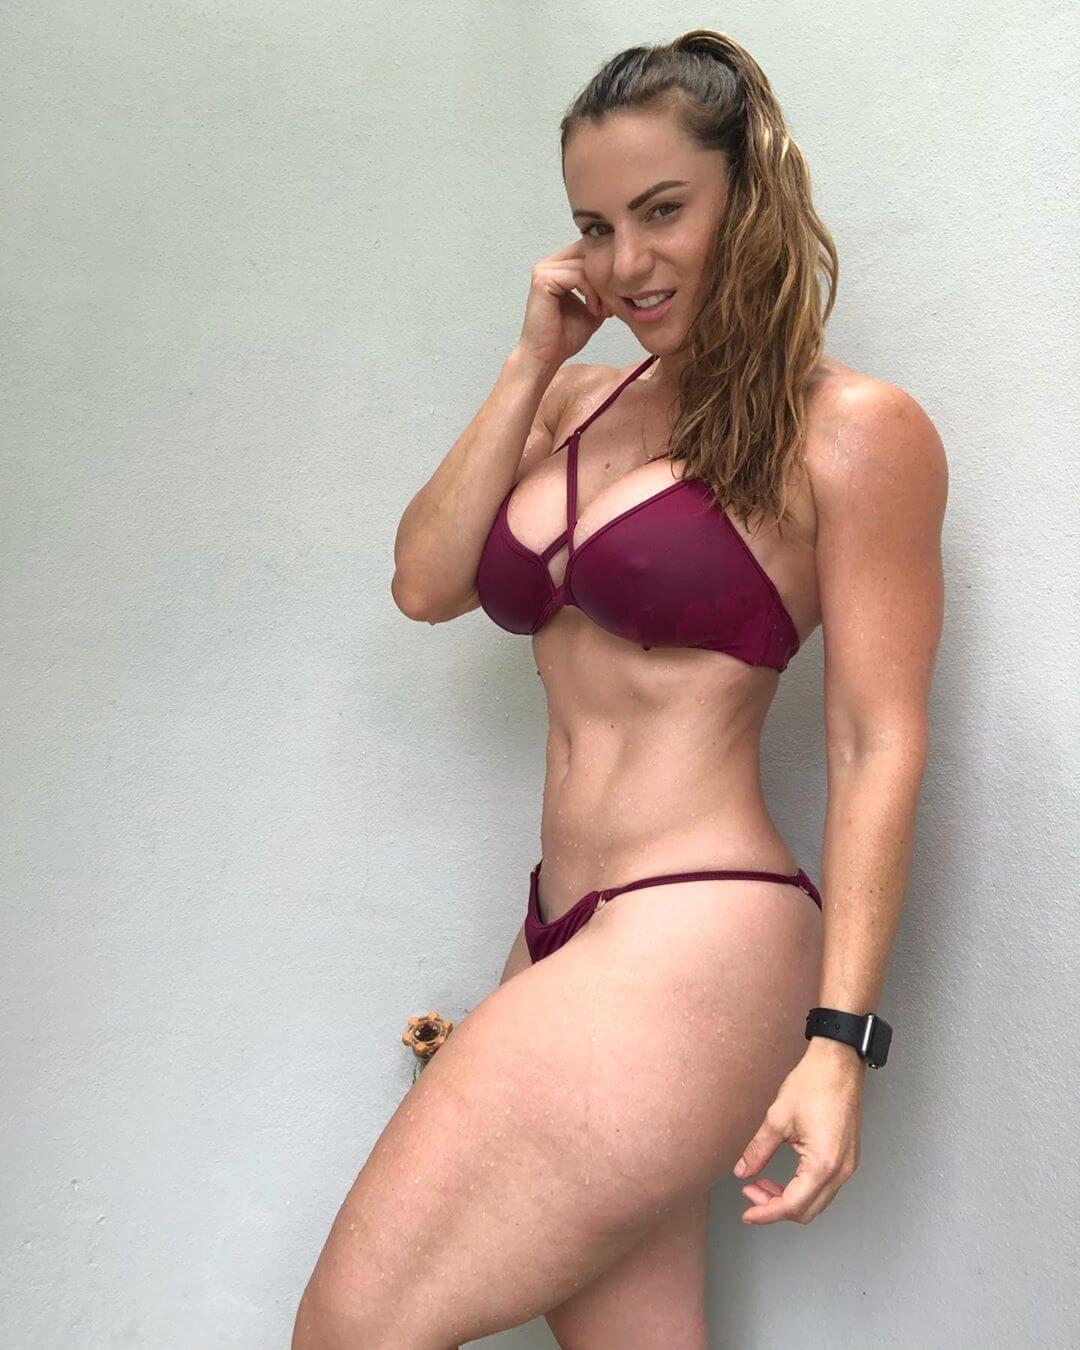 Linda Durbesson hot photo